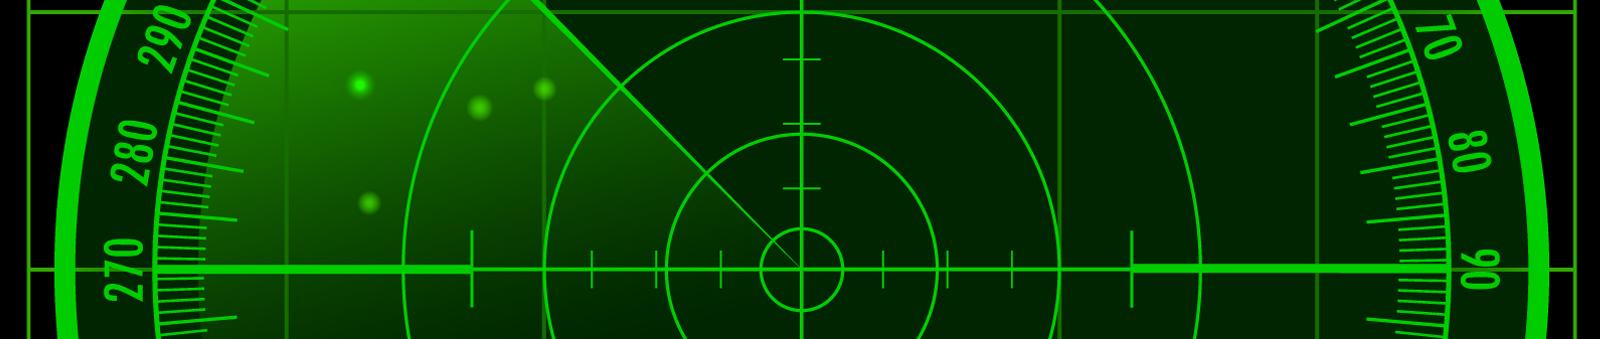 Radar - Controleur de vitesse